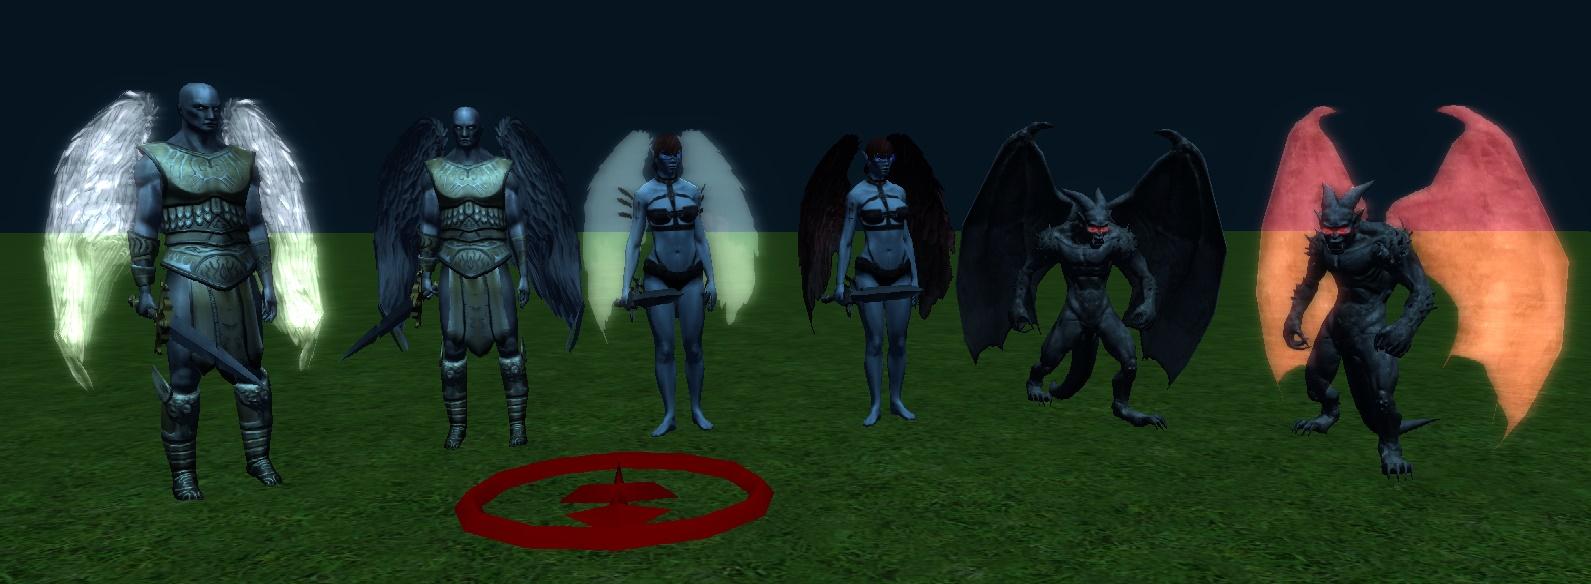 test_wings_night